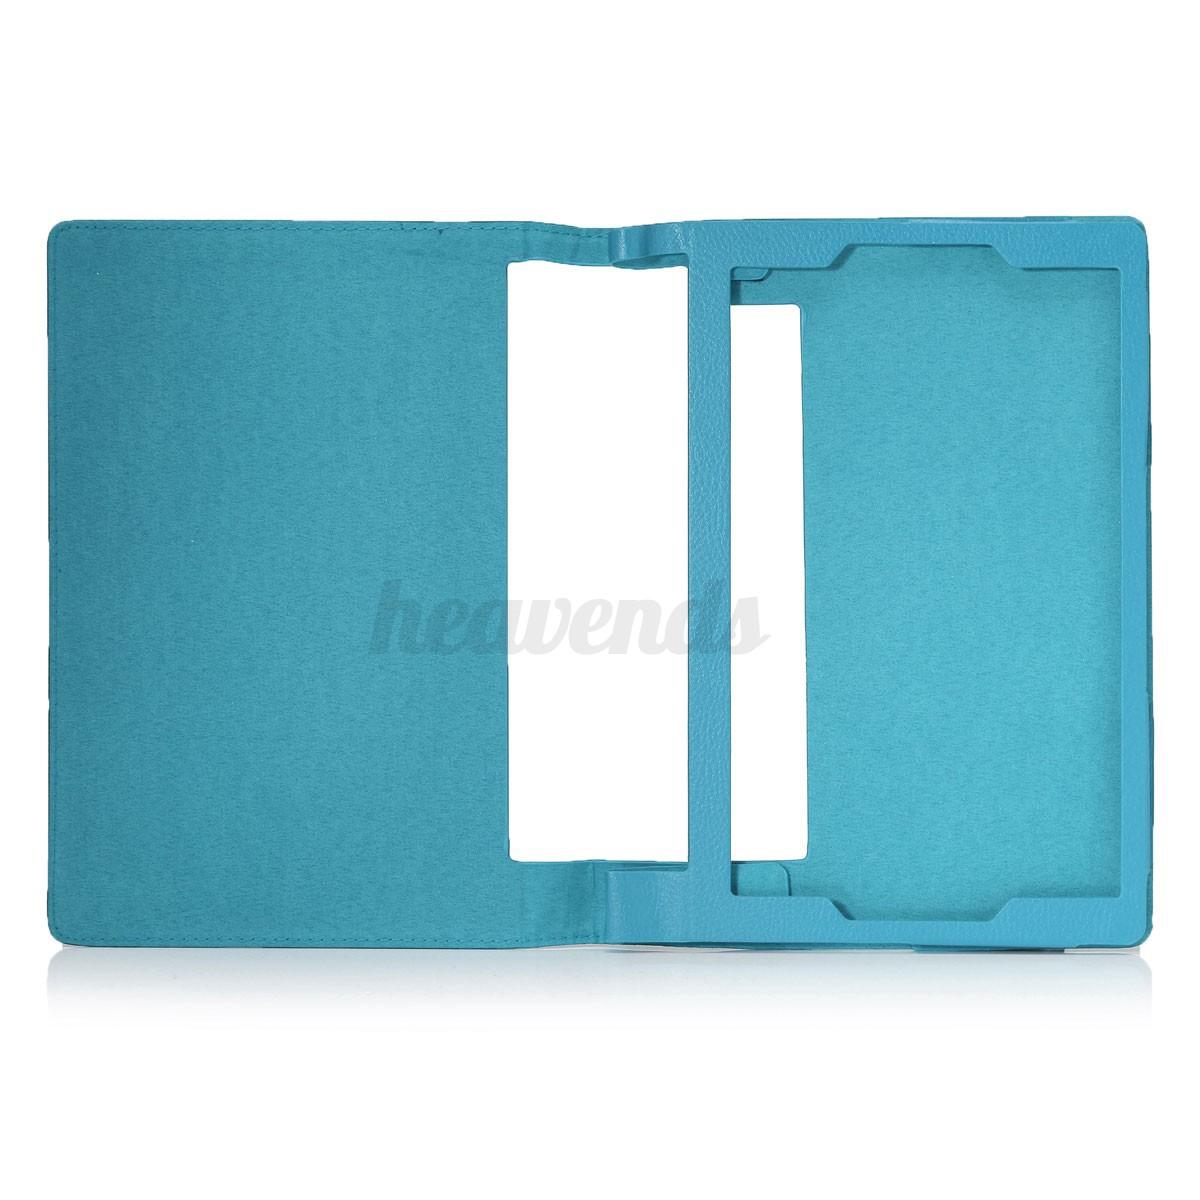 Housse etui coque case cover pr lenovo yoga tab 3 10 x50l for Housse tablette 10 1